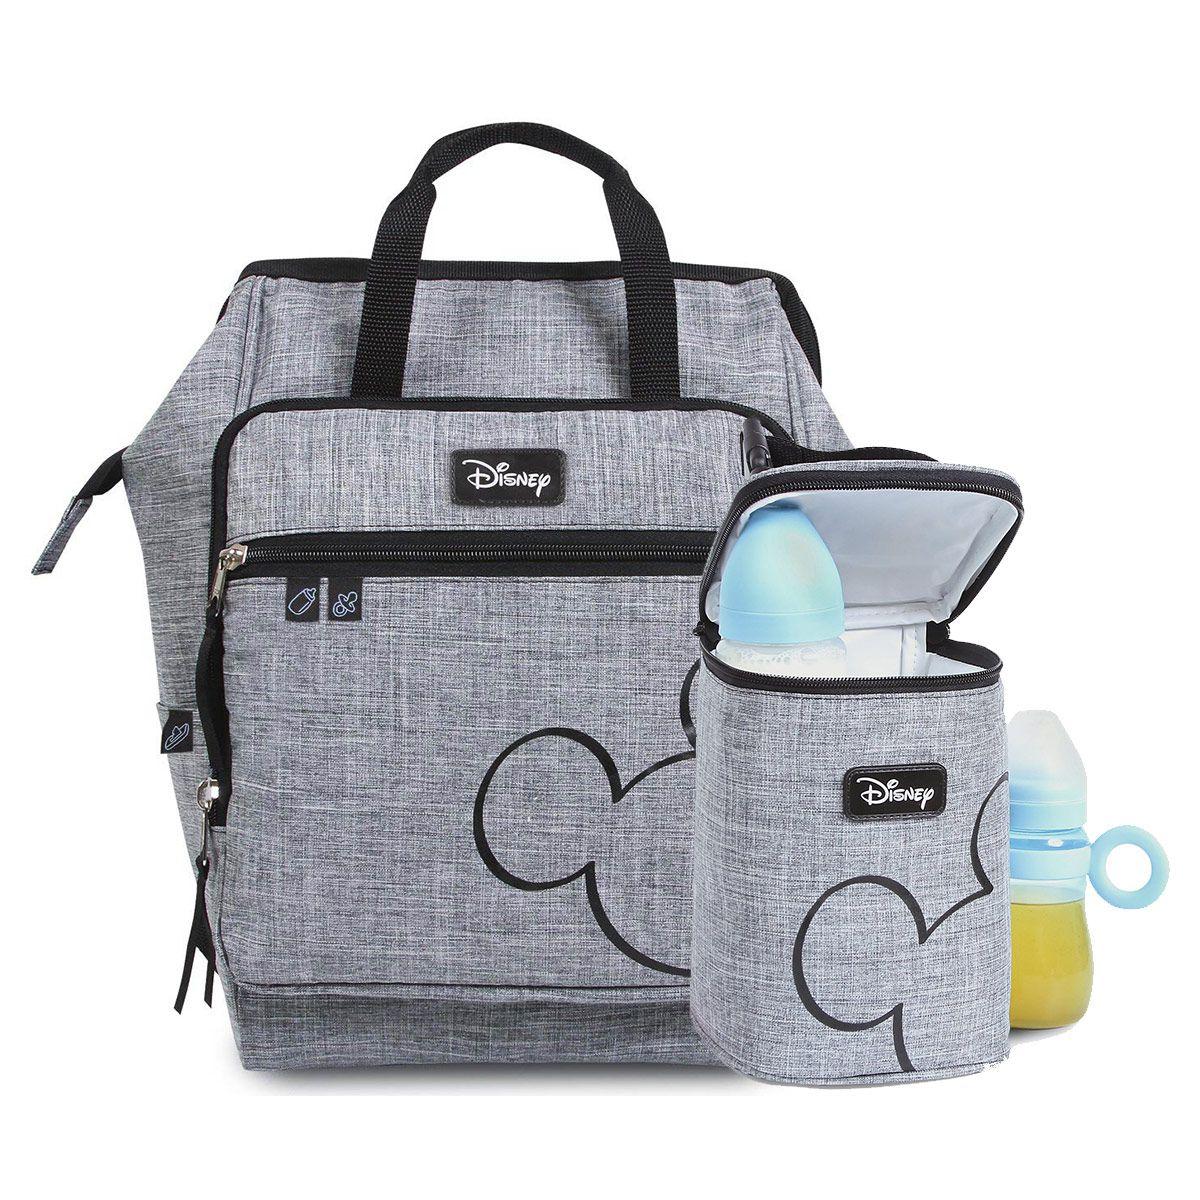 Kit Baby Bag Mochila + Porta Mamadeira Mickey Mouse Cinza c/ Trocador Disney